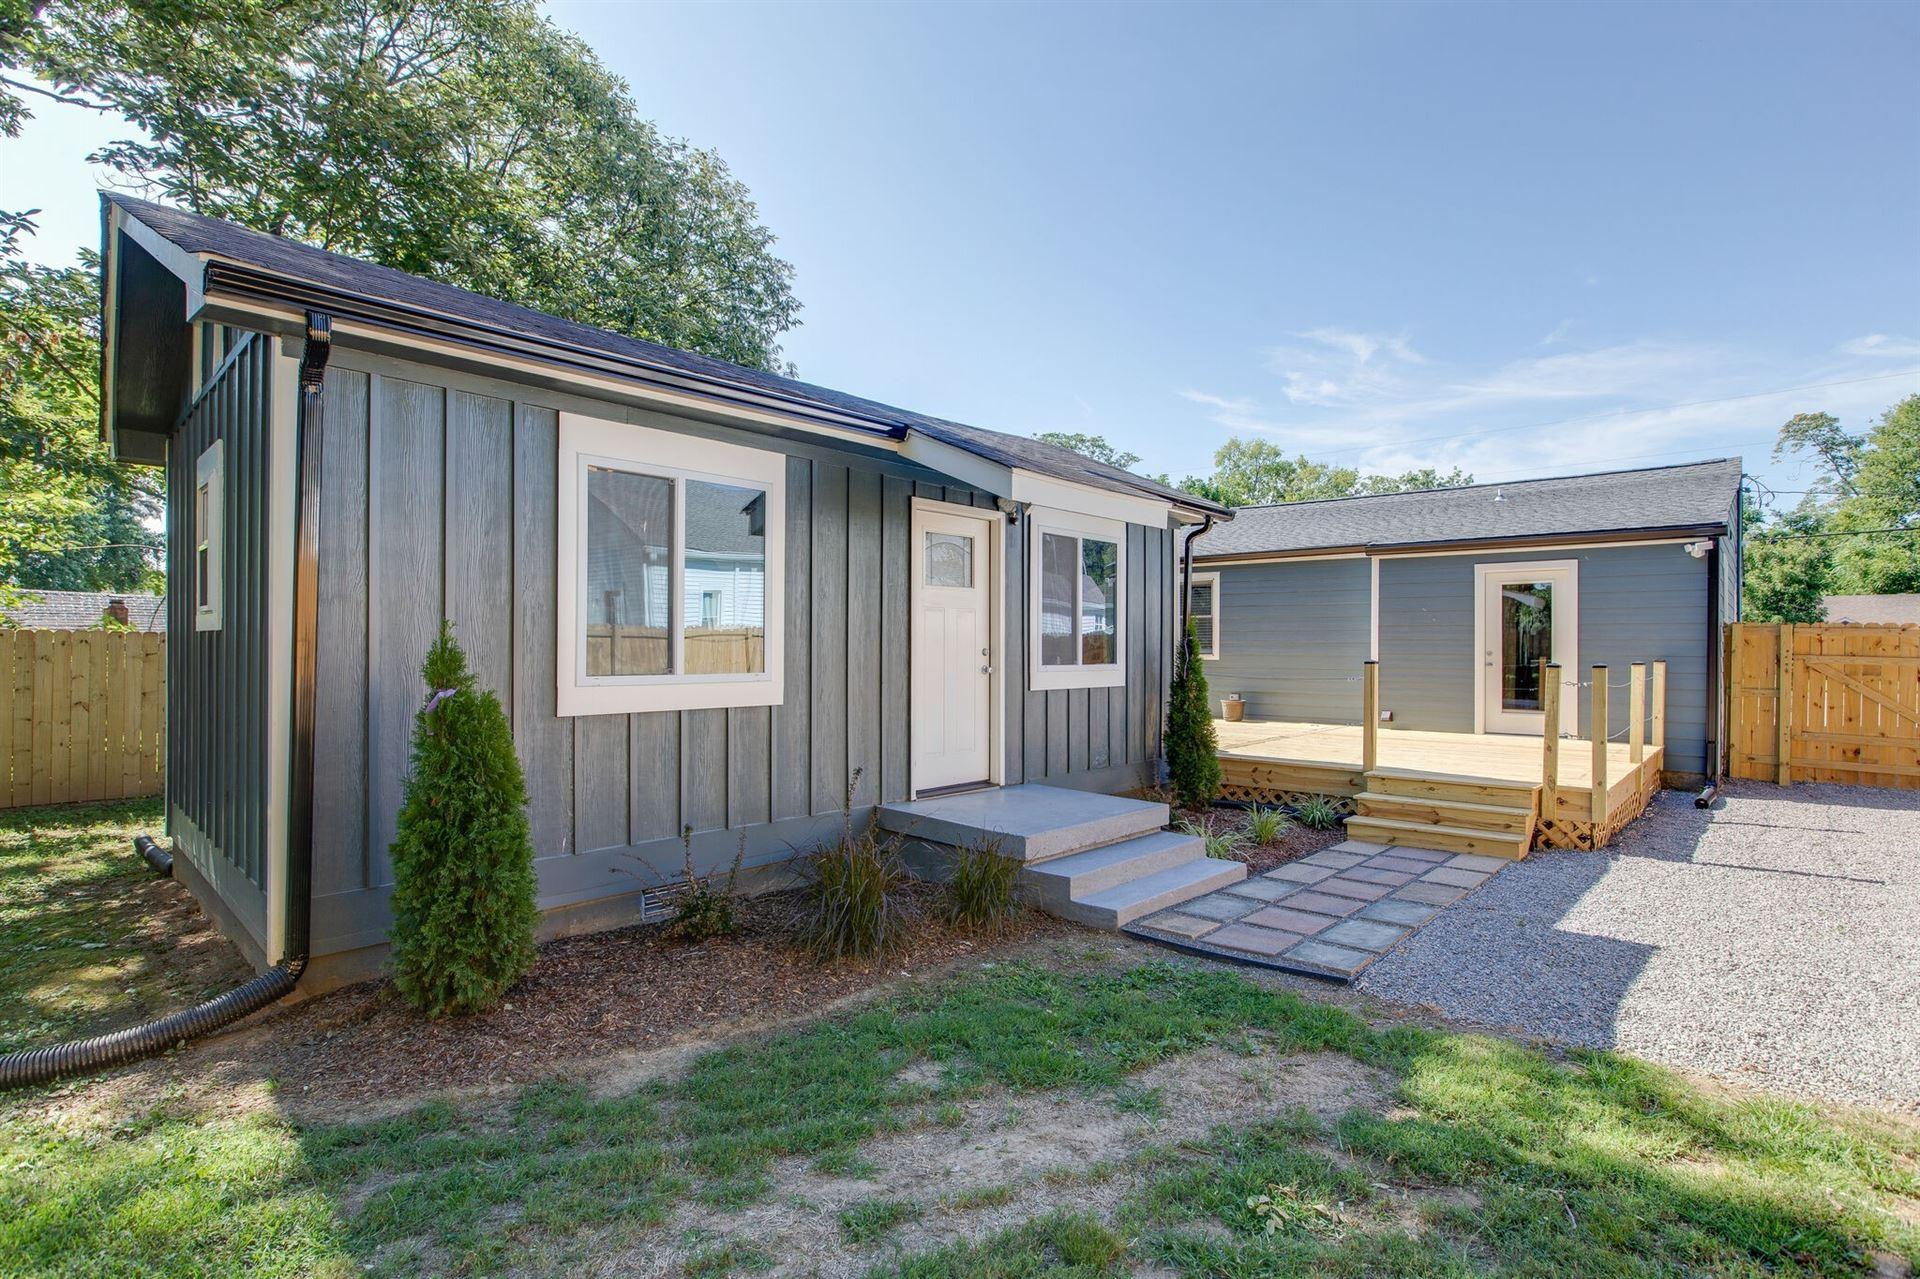 Photo of 512 Eastview Cir, Franklin, TN 37064 (MLS # 2202068)